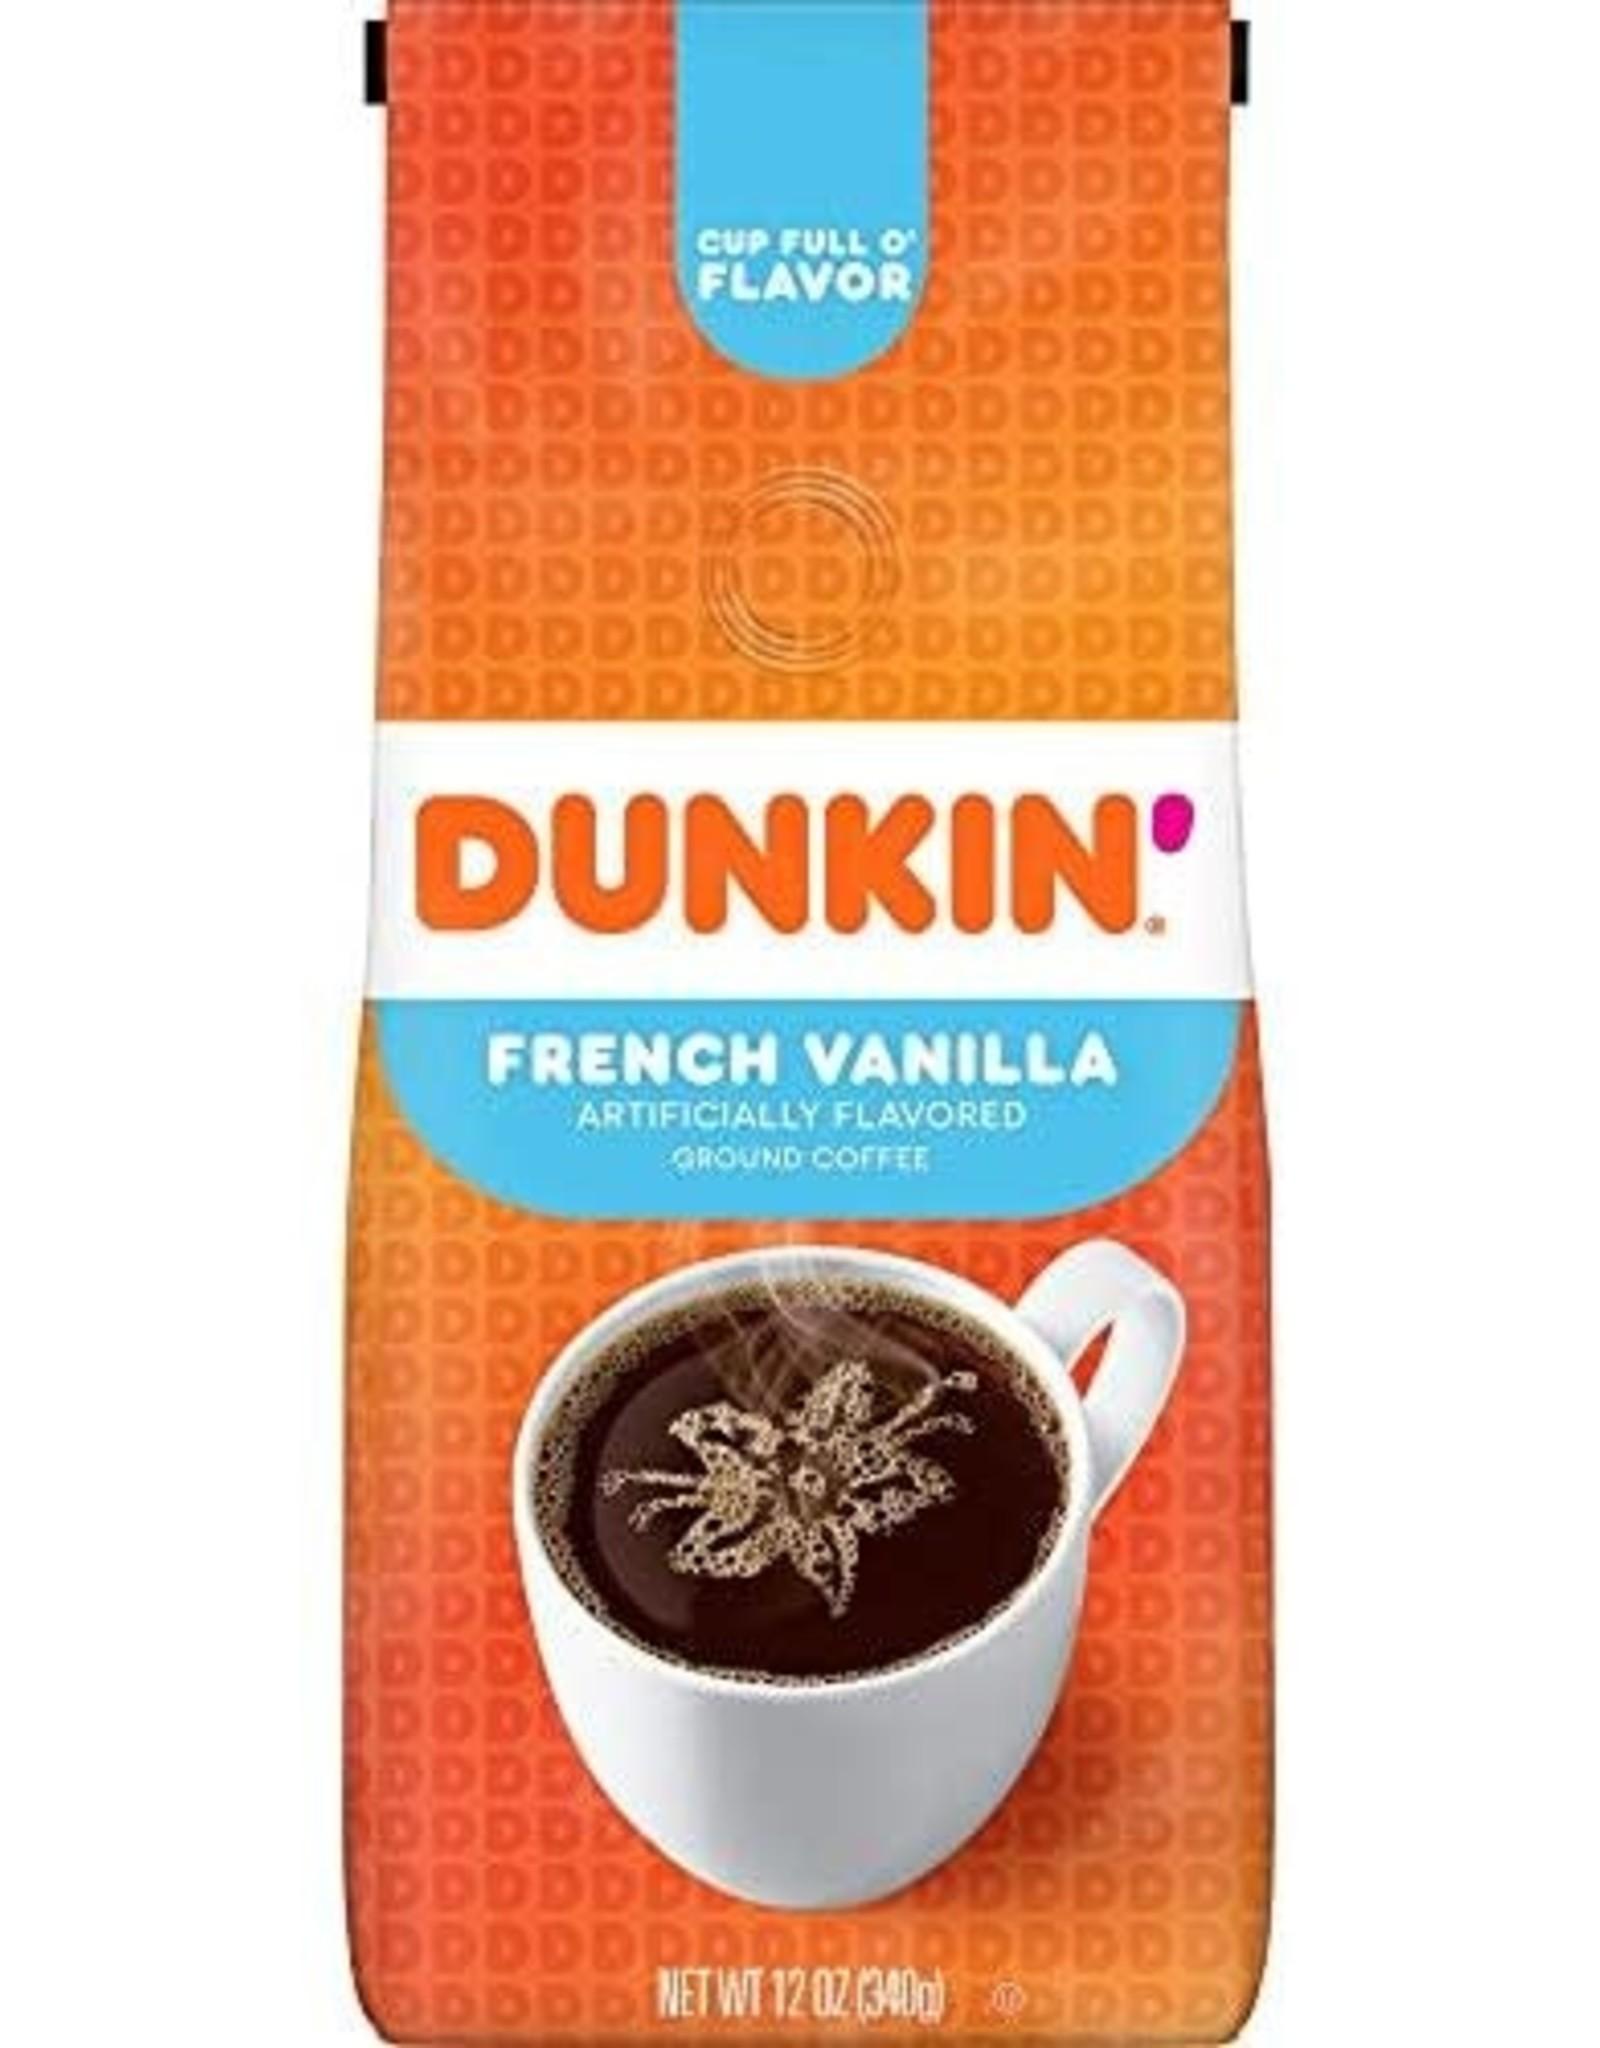 Dunkin Donuts French Vanilla Ground Coffee - 340g